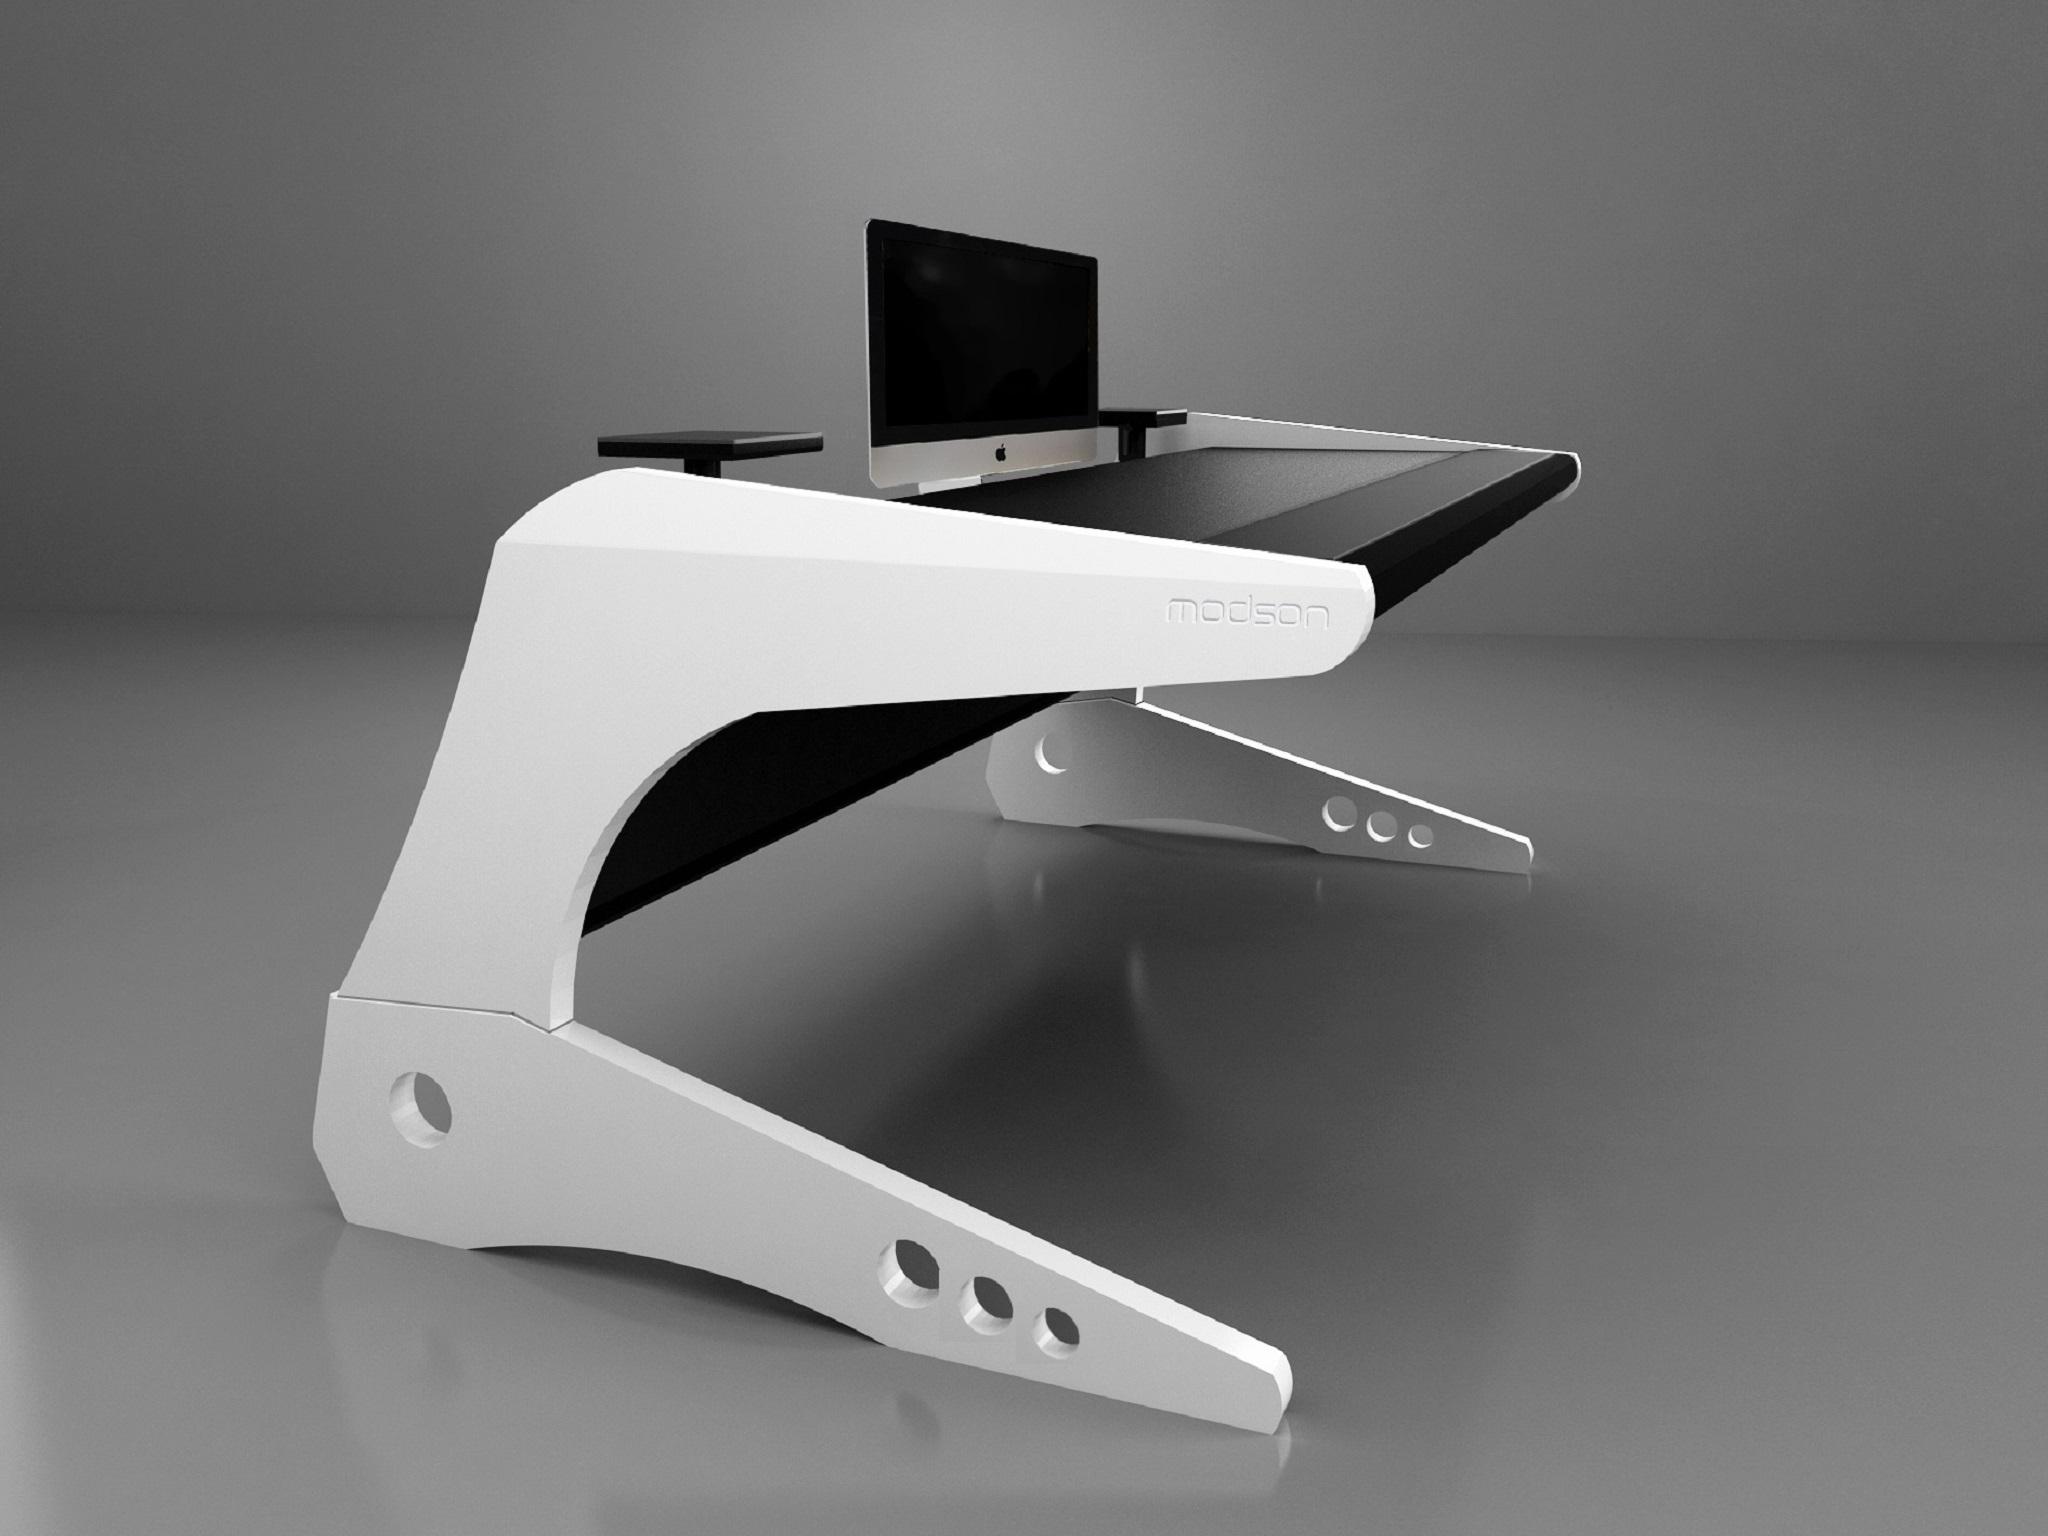 Modson studio furniture handcraft studio furniture and for Studio furniture